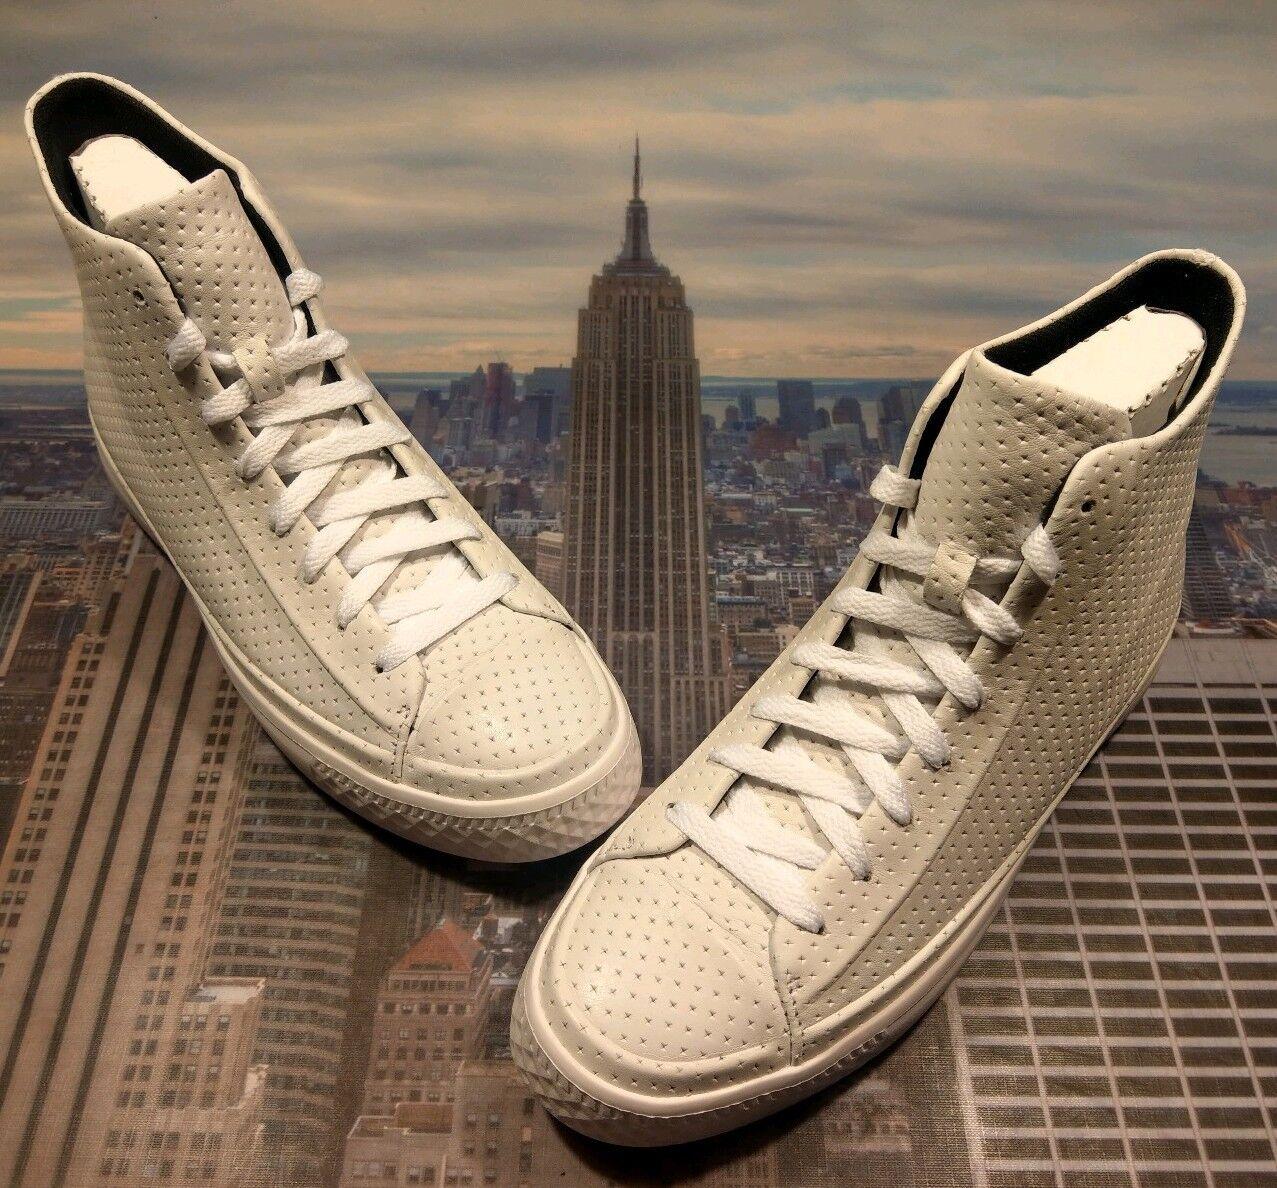 Converse Chuck Taylor Star moderno Hi High Top All blancoo Talla 7.5 157477c Nuevo